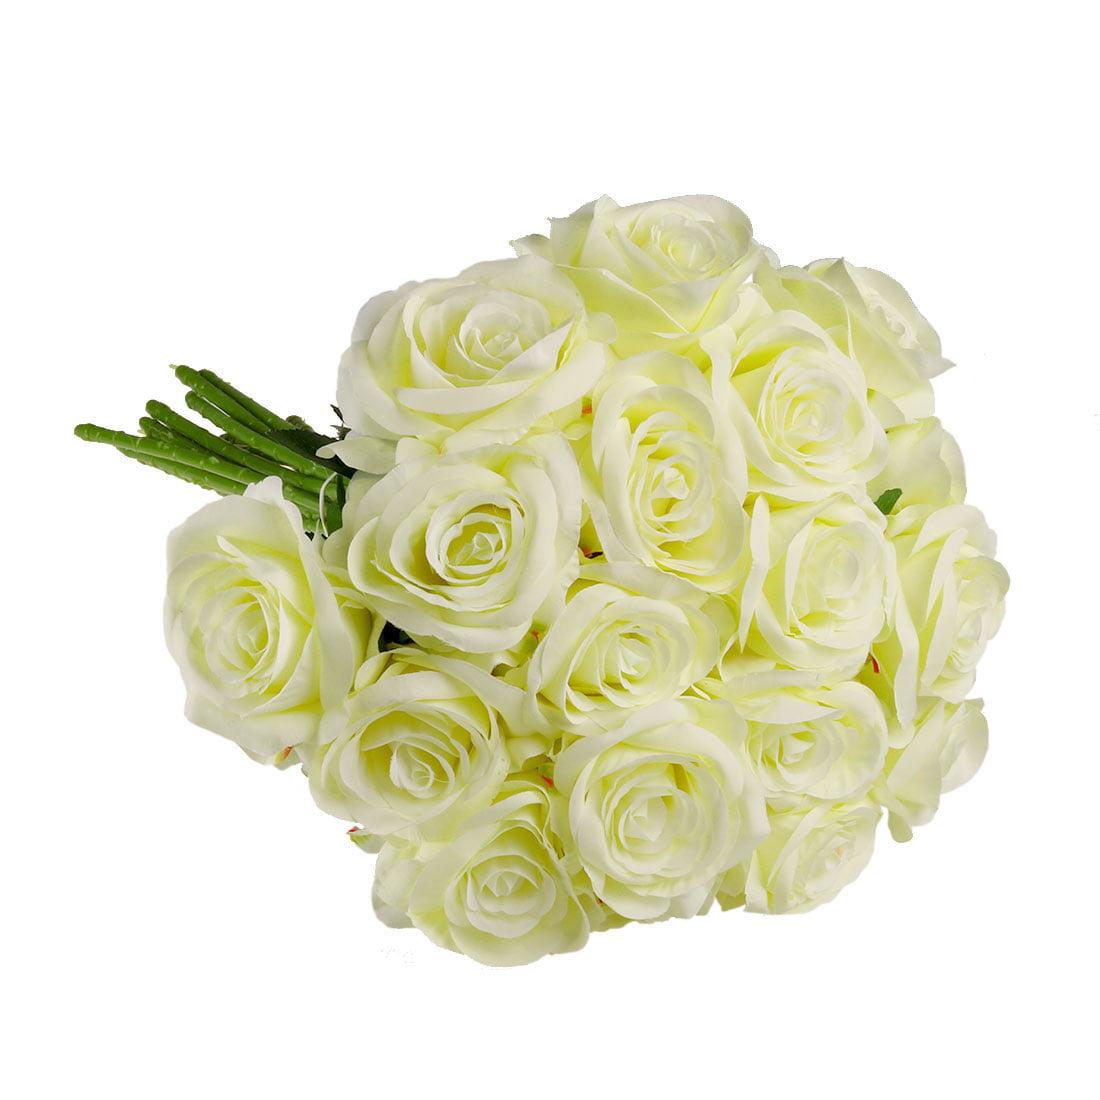 Artificial Silk Rose Flower Bouquet Wedding Party Home Decor